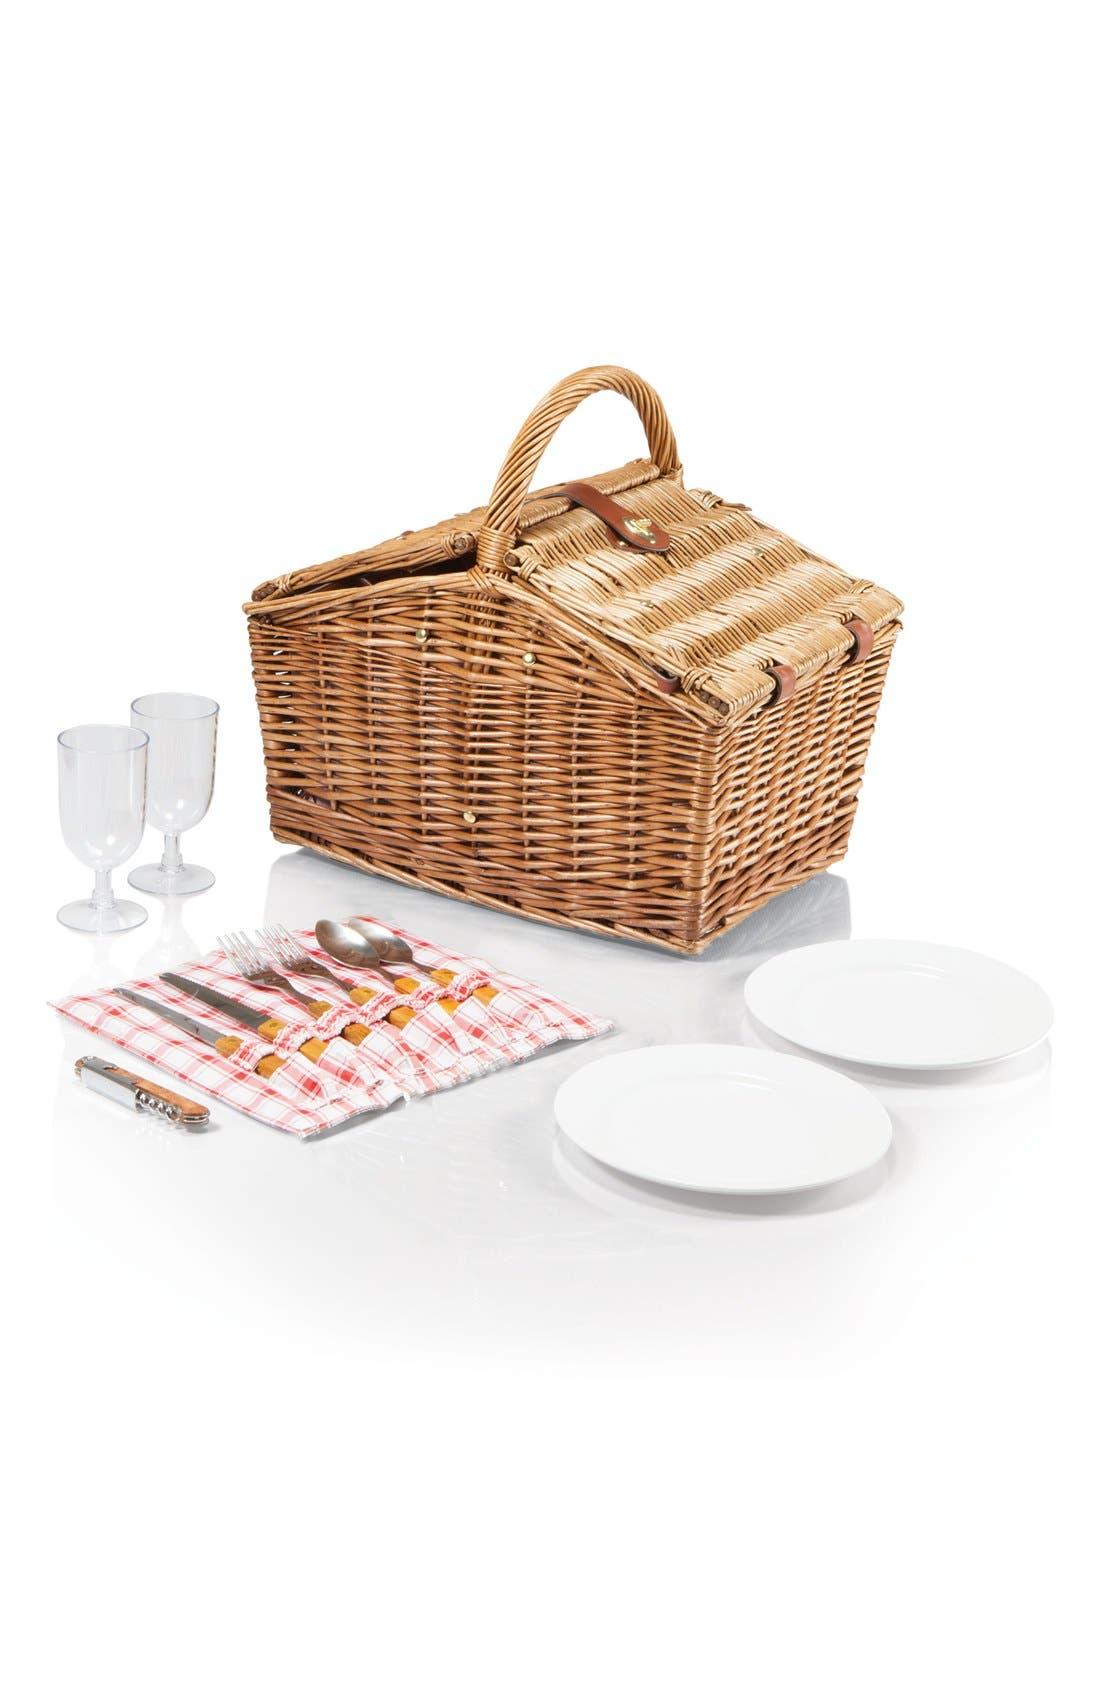 Alternate Image 2  - Picnic Time 'Piccadilly' Wicker Picnic Basket